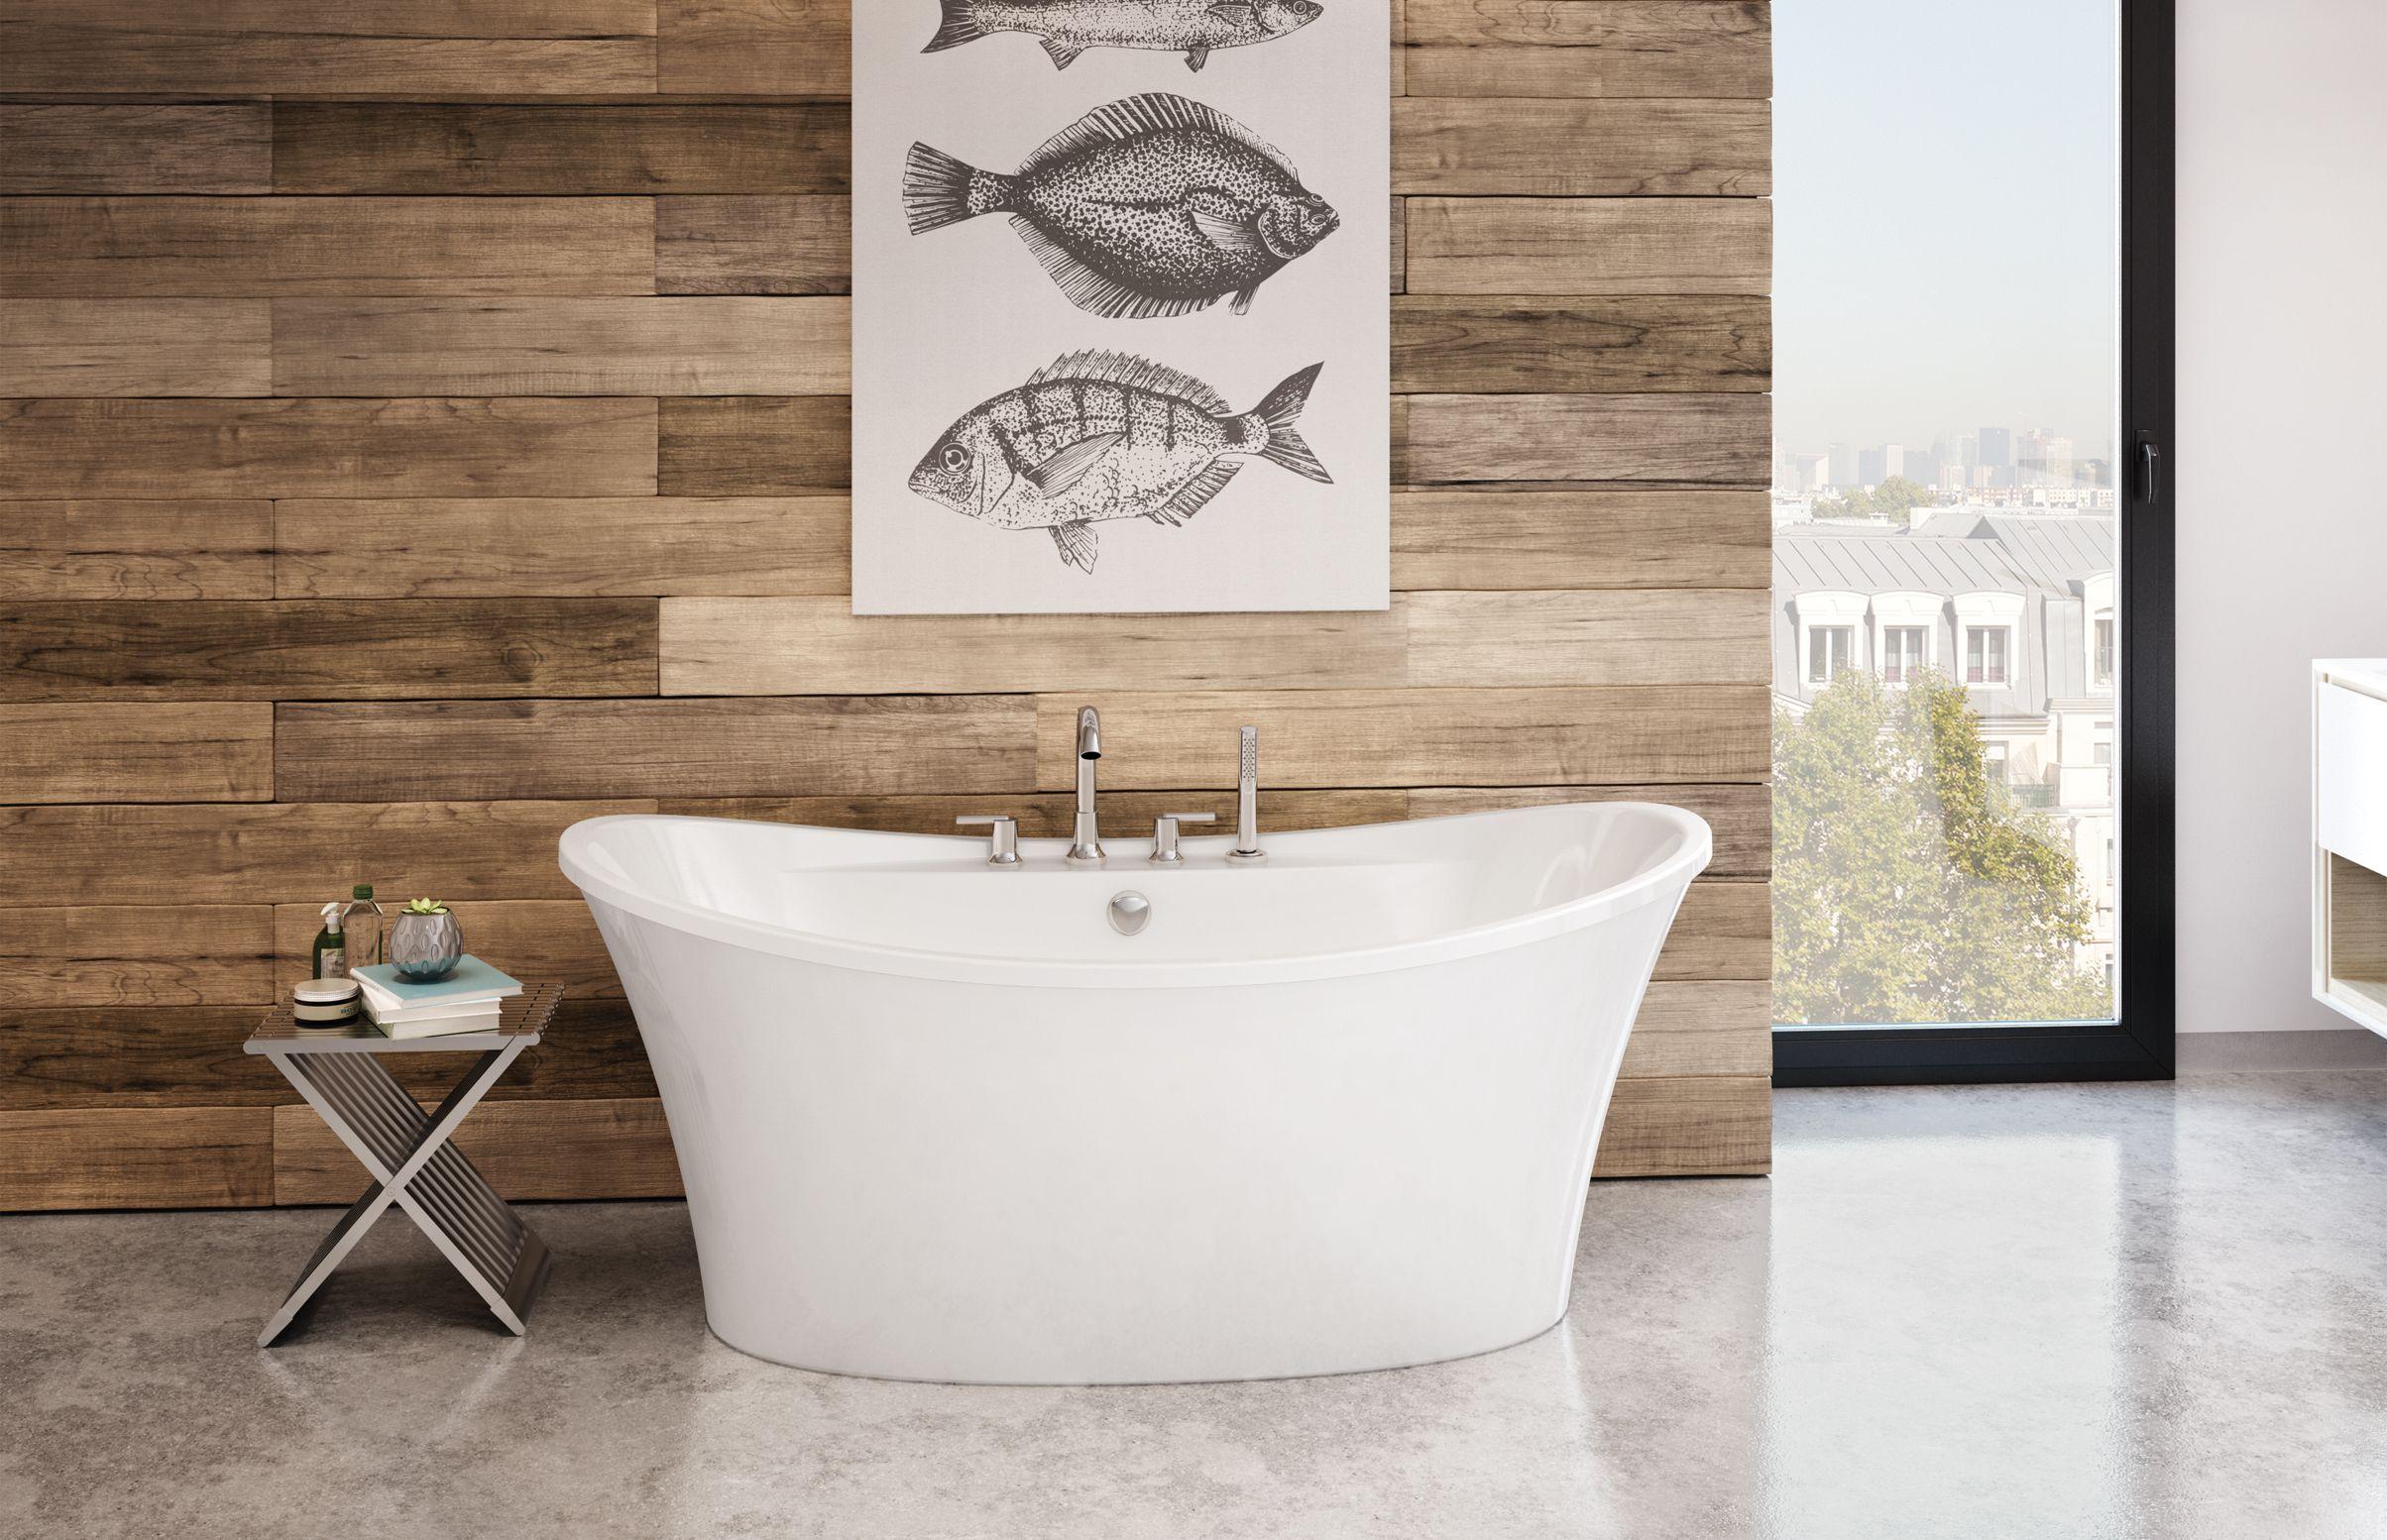 Ariosa 6636 | Pinterest | Bathtubs, Bath and Dream bathrooms